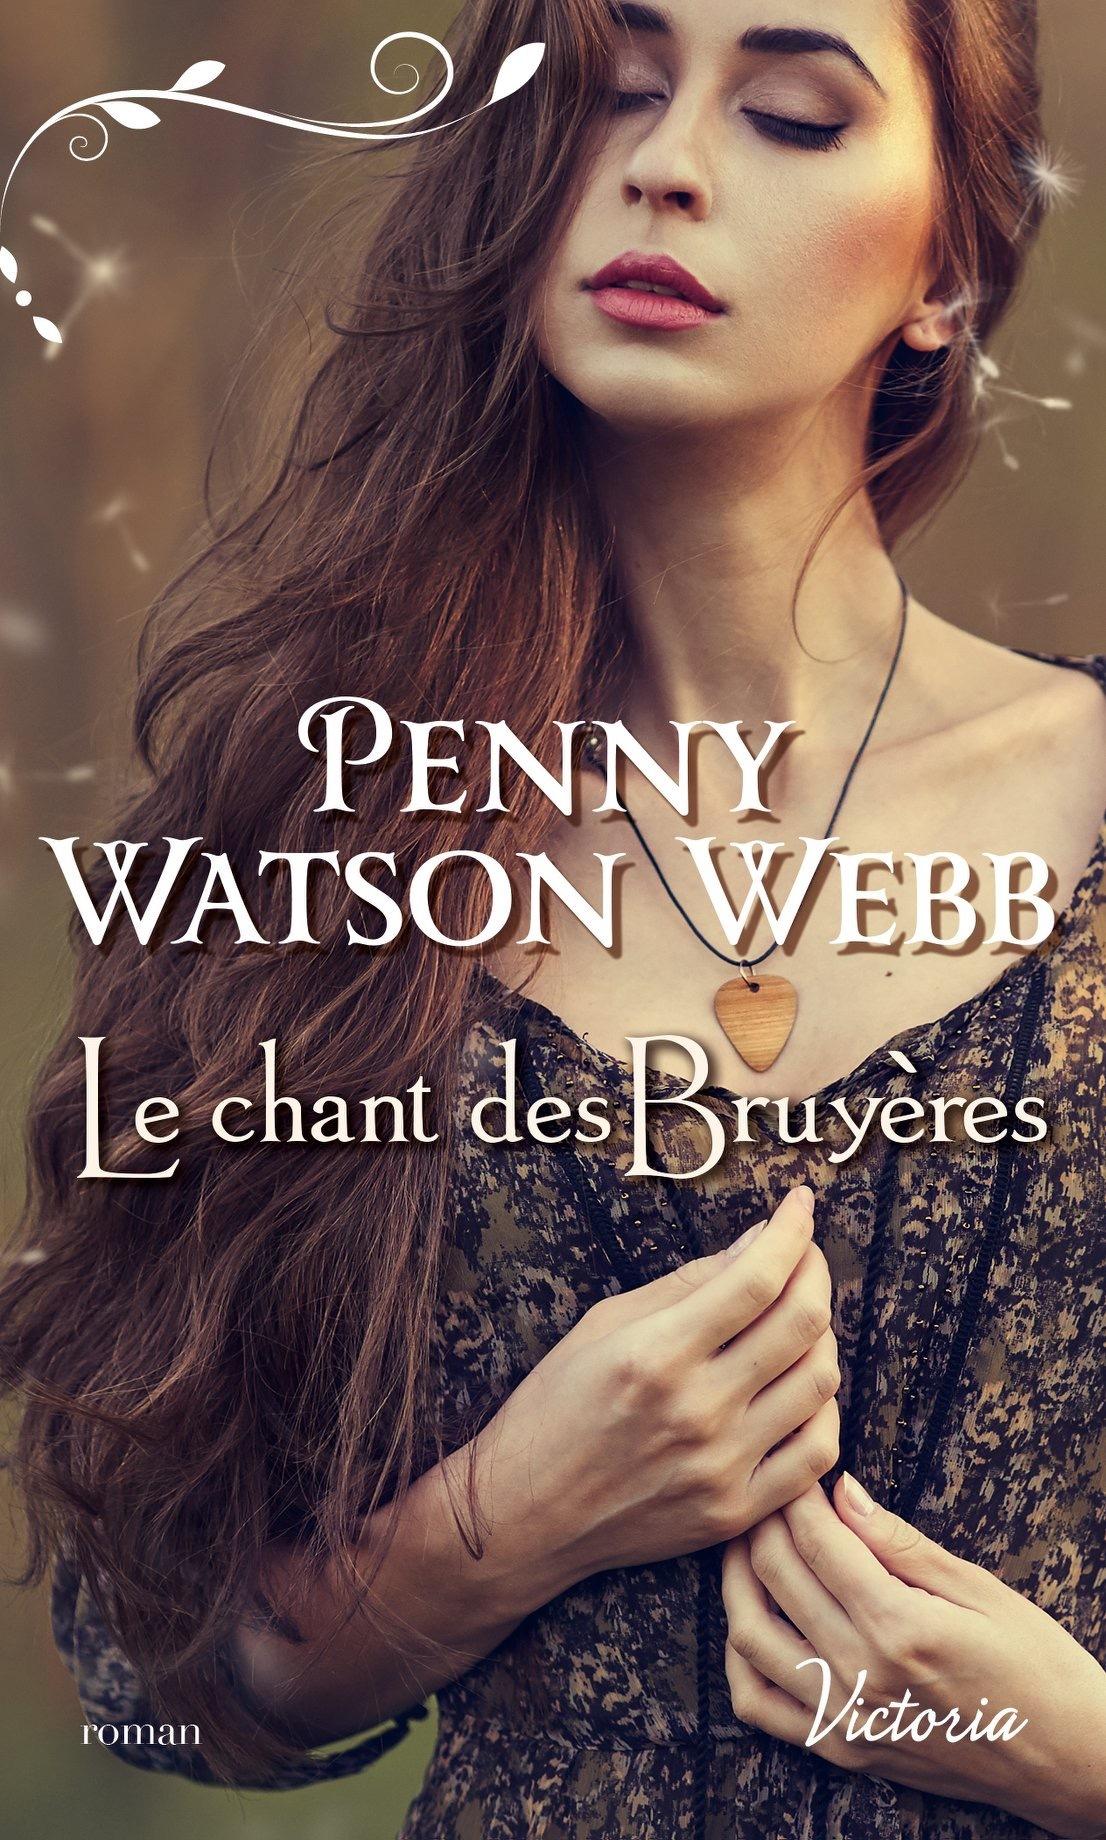 cdn1.booknode.com/book_cover/1153/full/le-chant-des-bruyeres-1152566.jpg